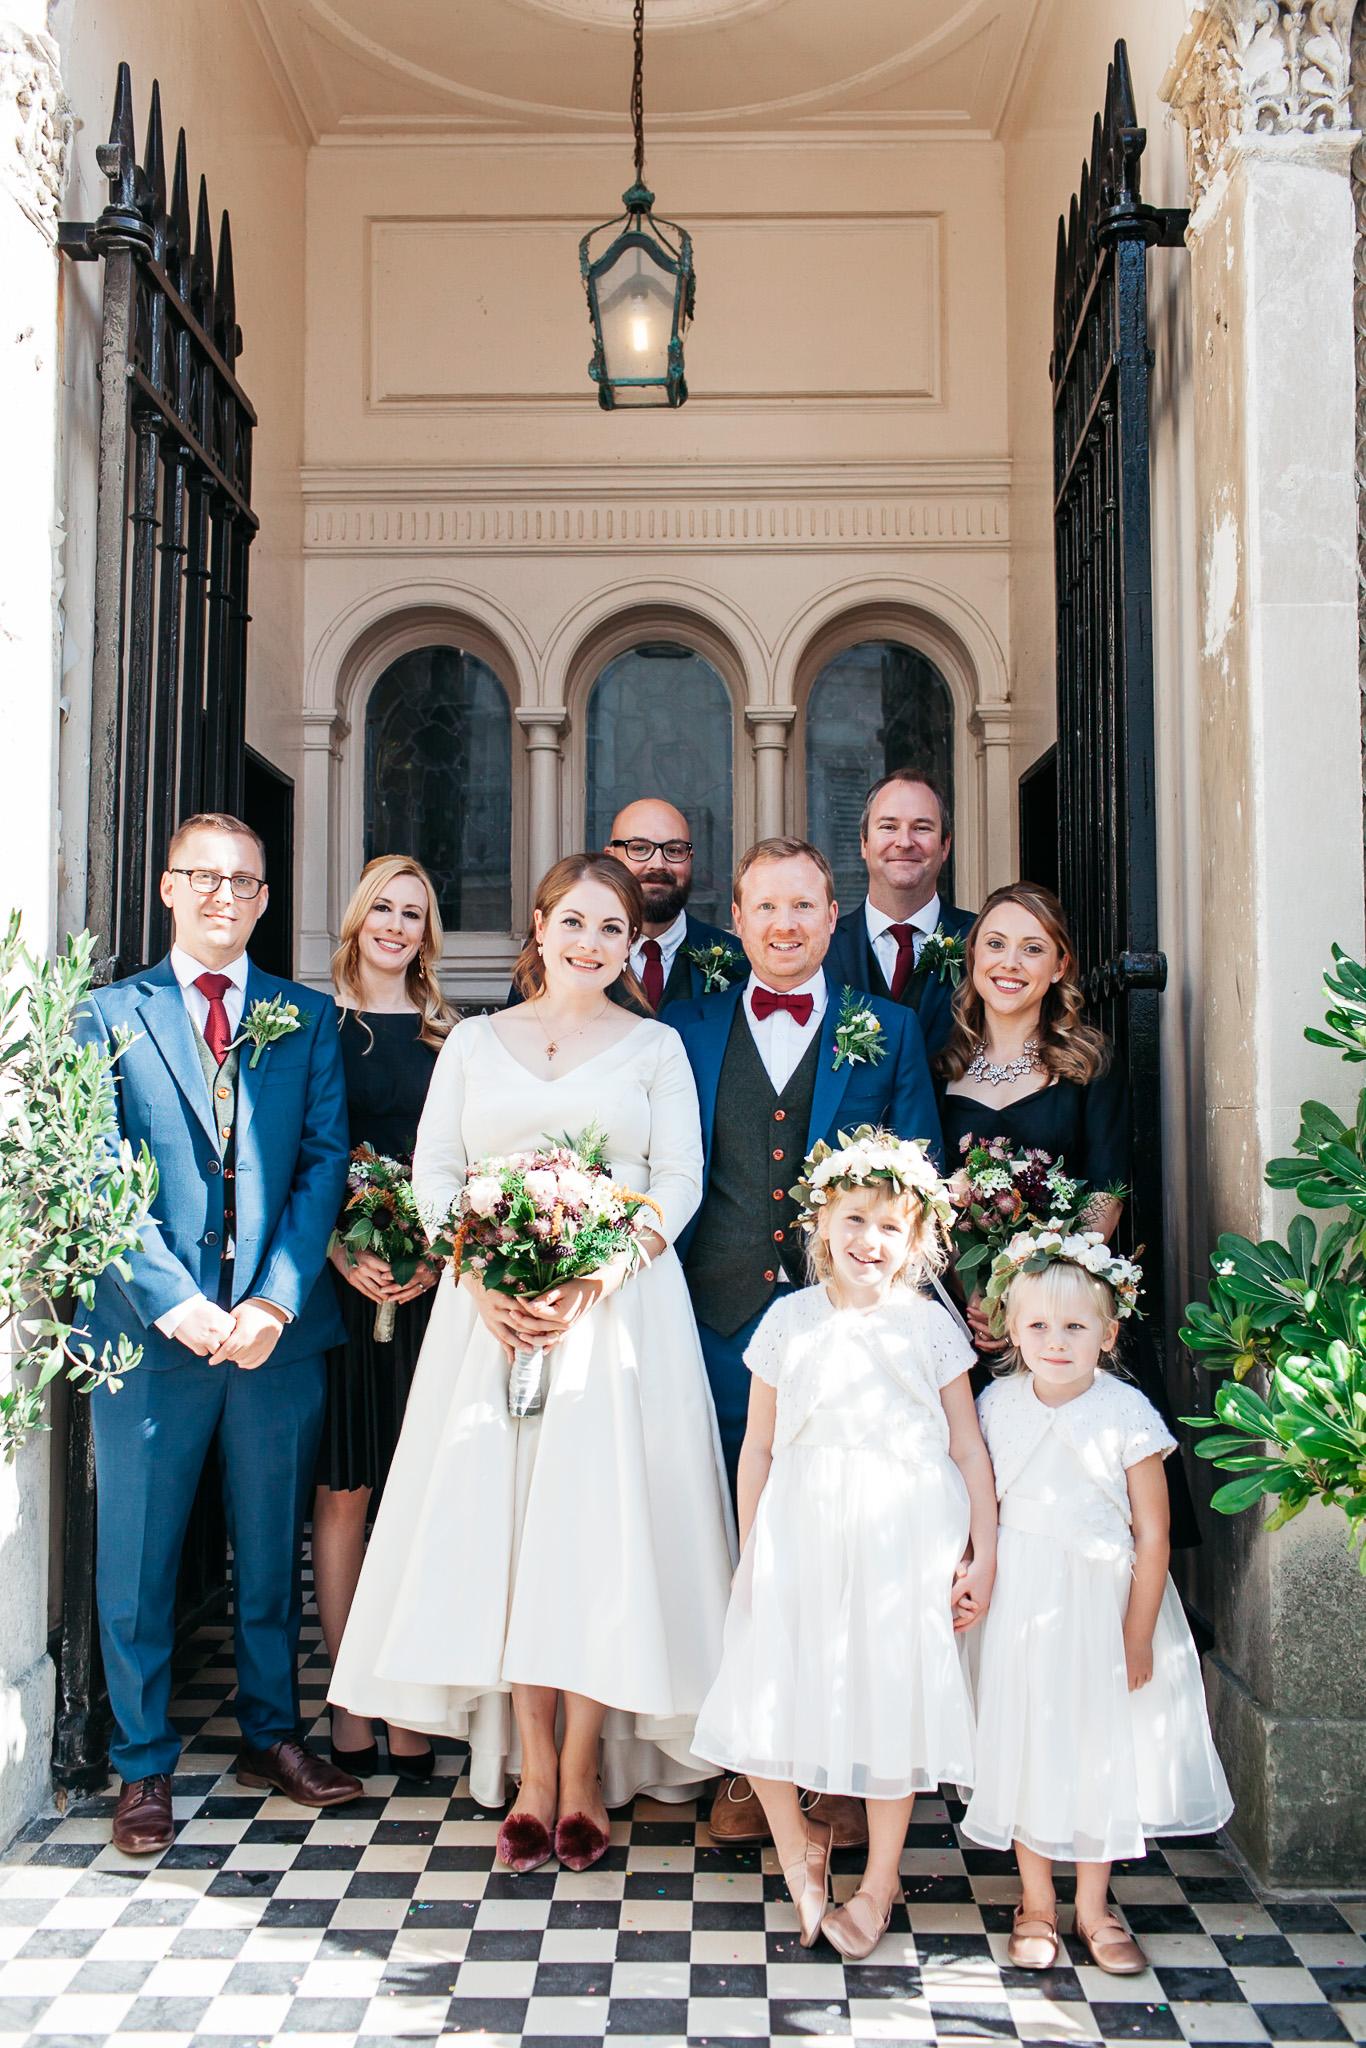 st_andrews_fabrica_brighton_wedding_571.jpg